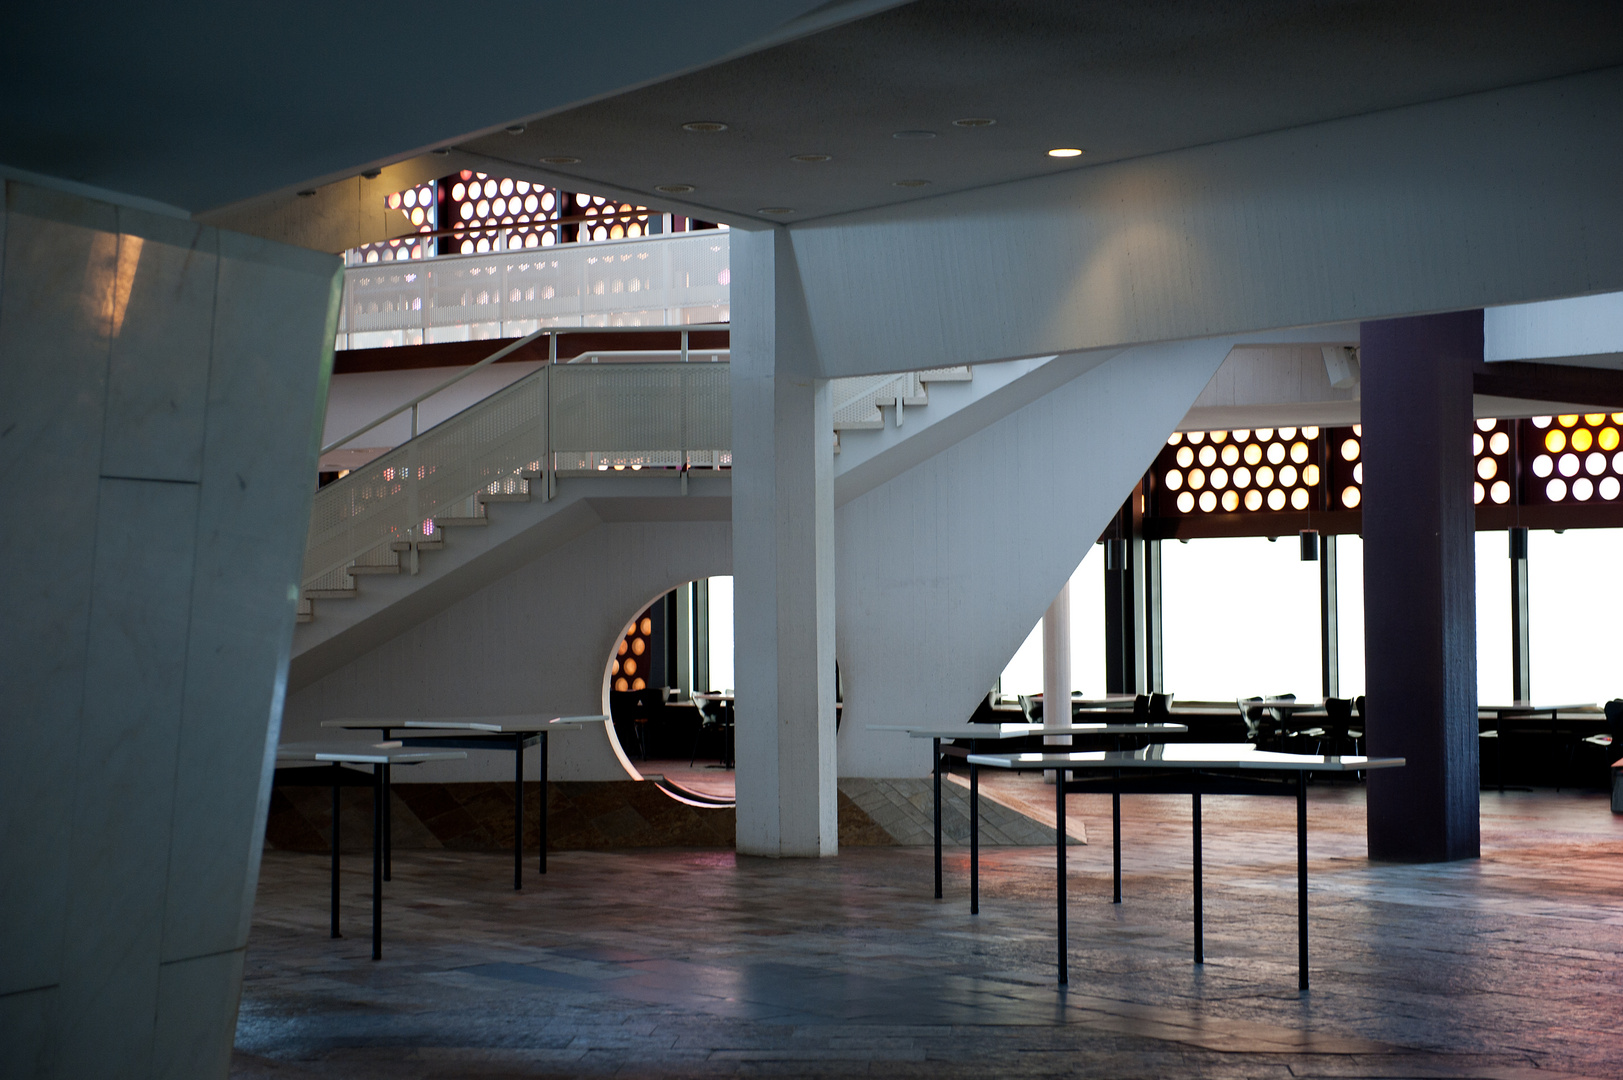 Foyer des Kammermusiksaales, Berlin